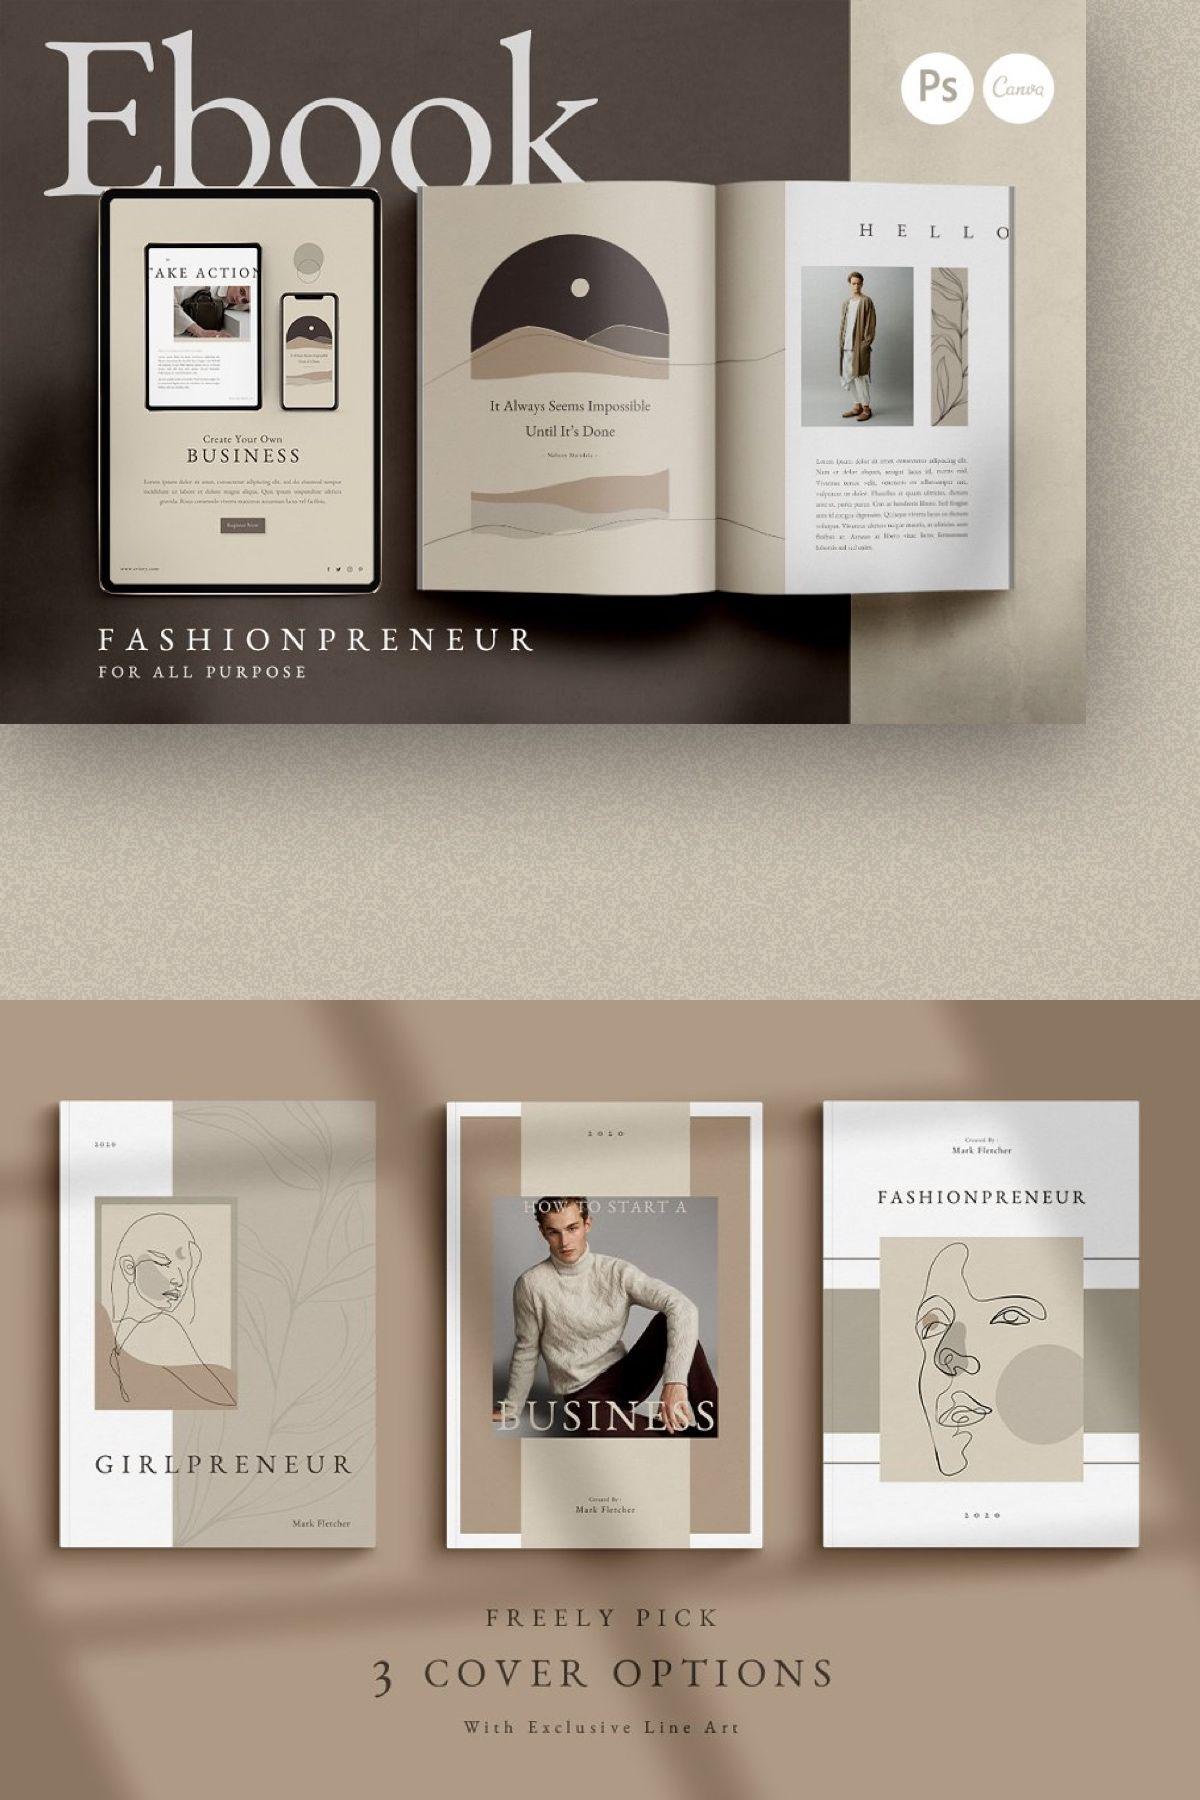 Ebook Fashionpreneur Coach Canva Ebook Design Ebook Template Magazine Layout Design